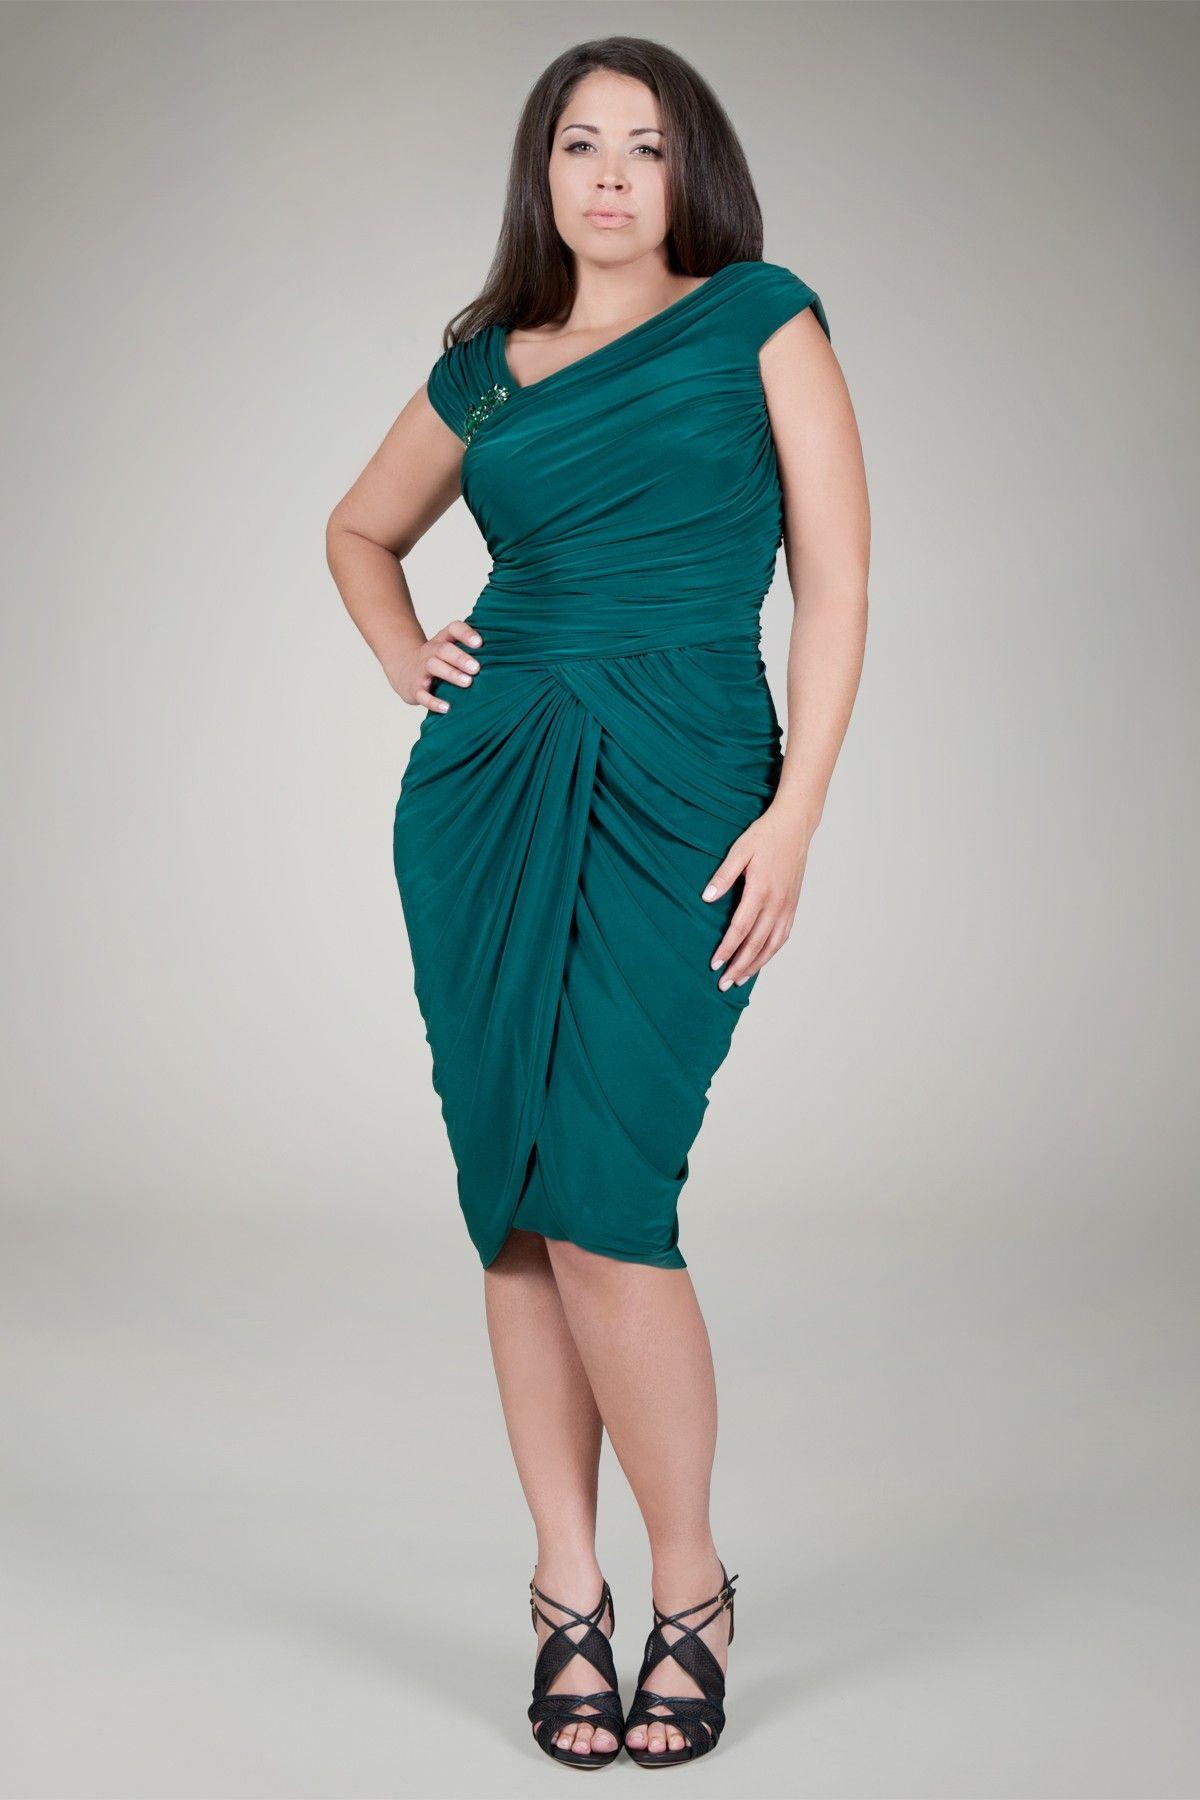 Plus Size Dresses For Weddings | WEDDING DRESS TREND | Pinterest ...